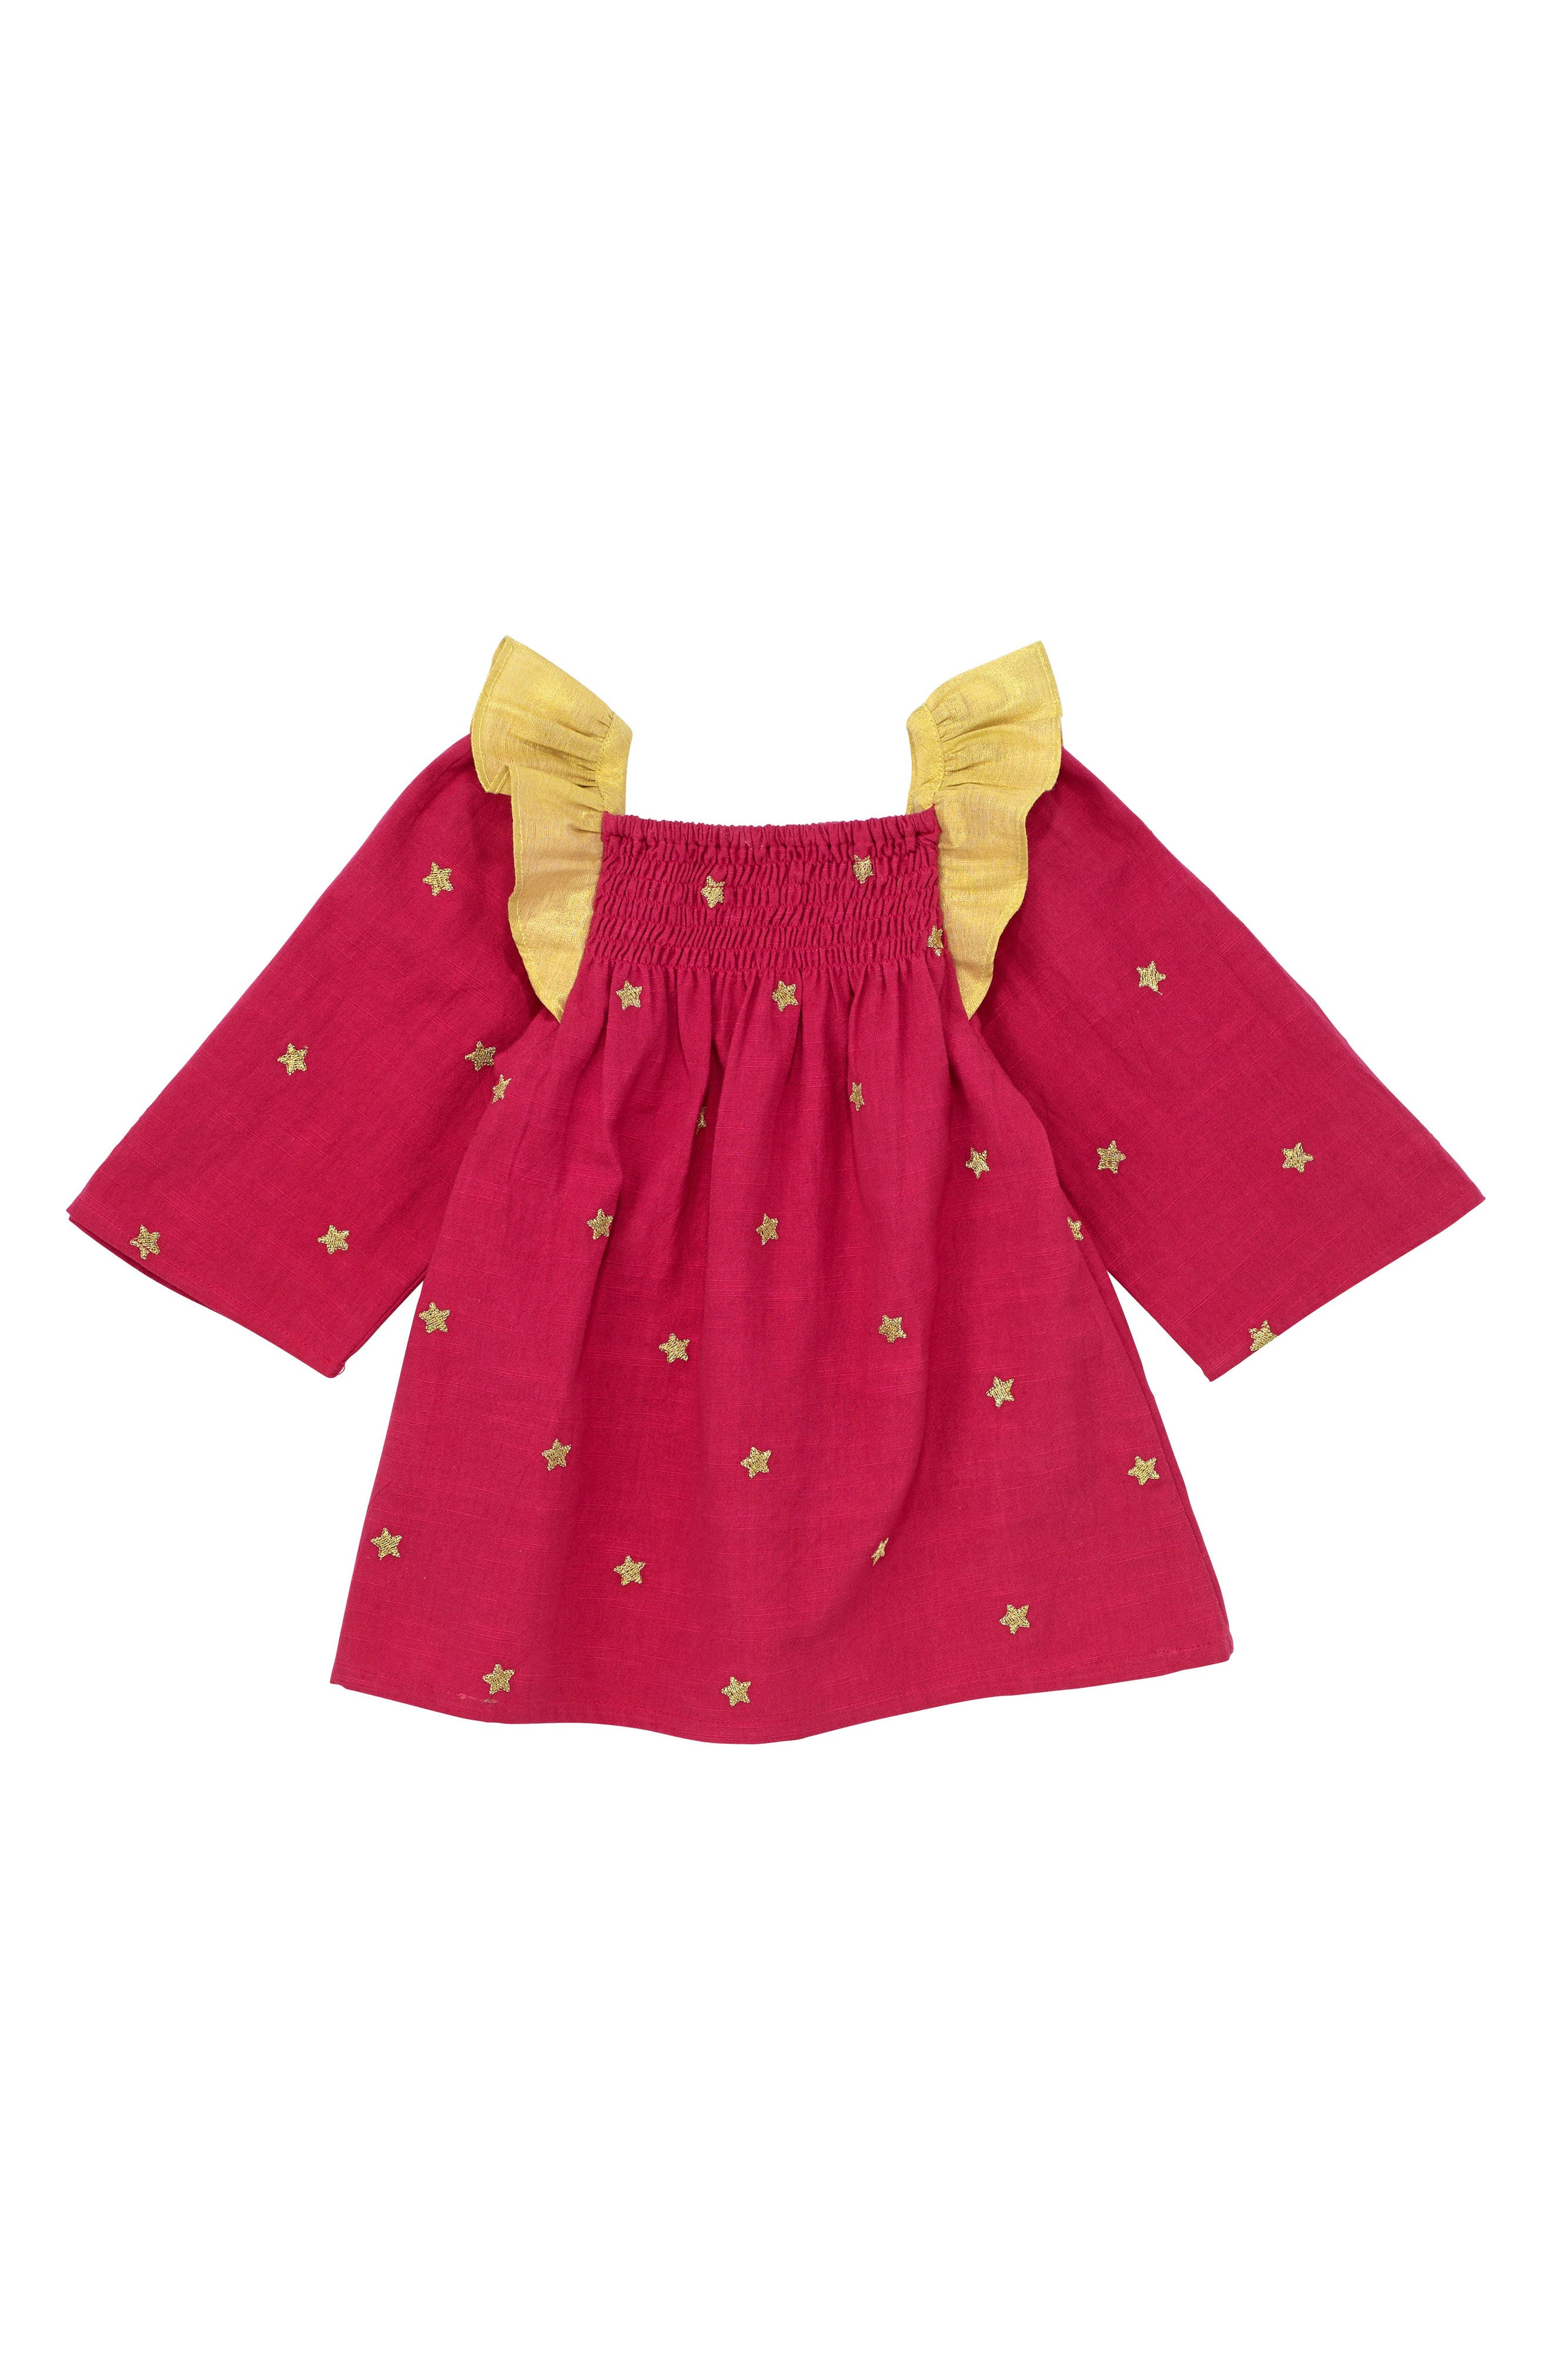 Alternate Image 1 Selected - Masalababy Galaxy Star Flutter Sleeve Dress (Toddler Girls, Little Girls & Big Girls)